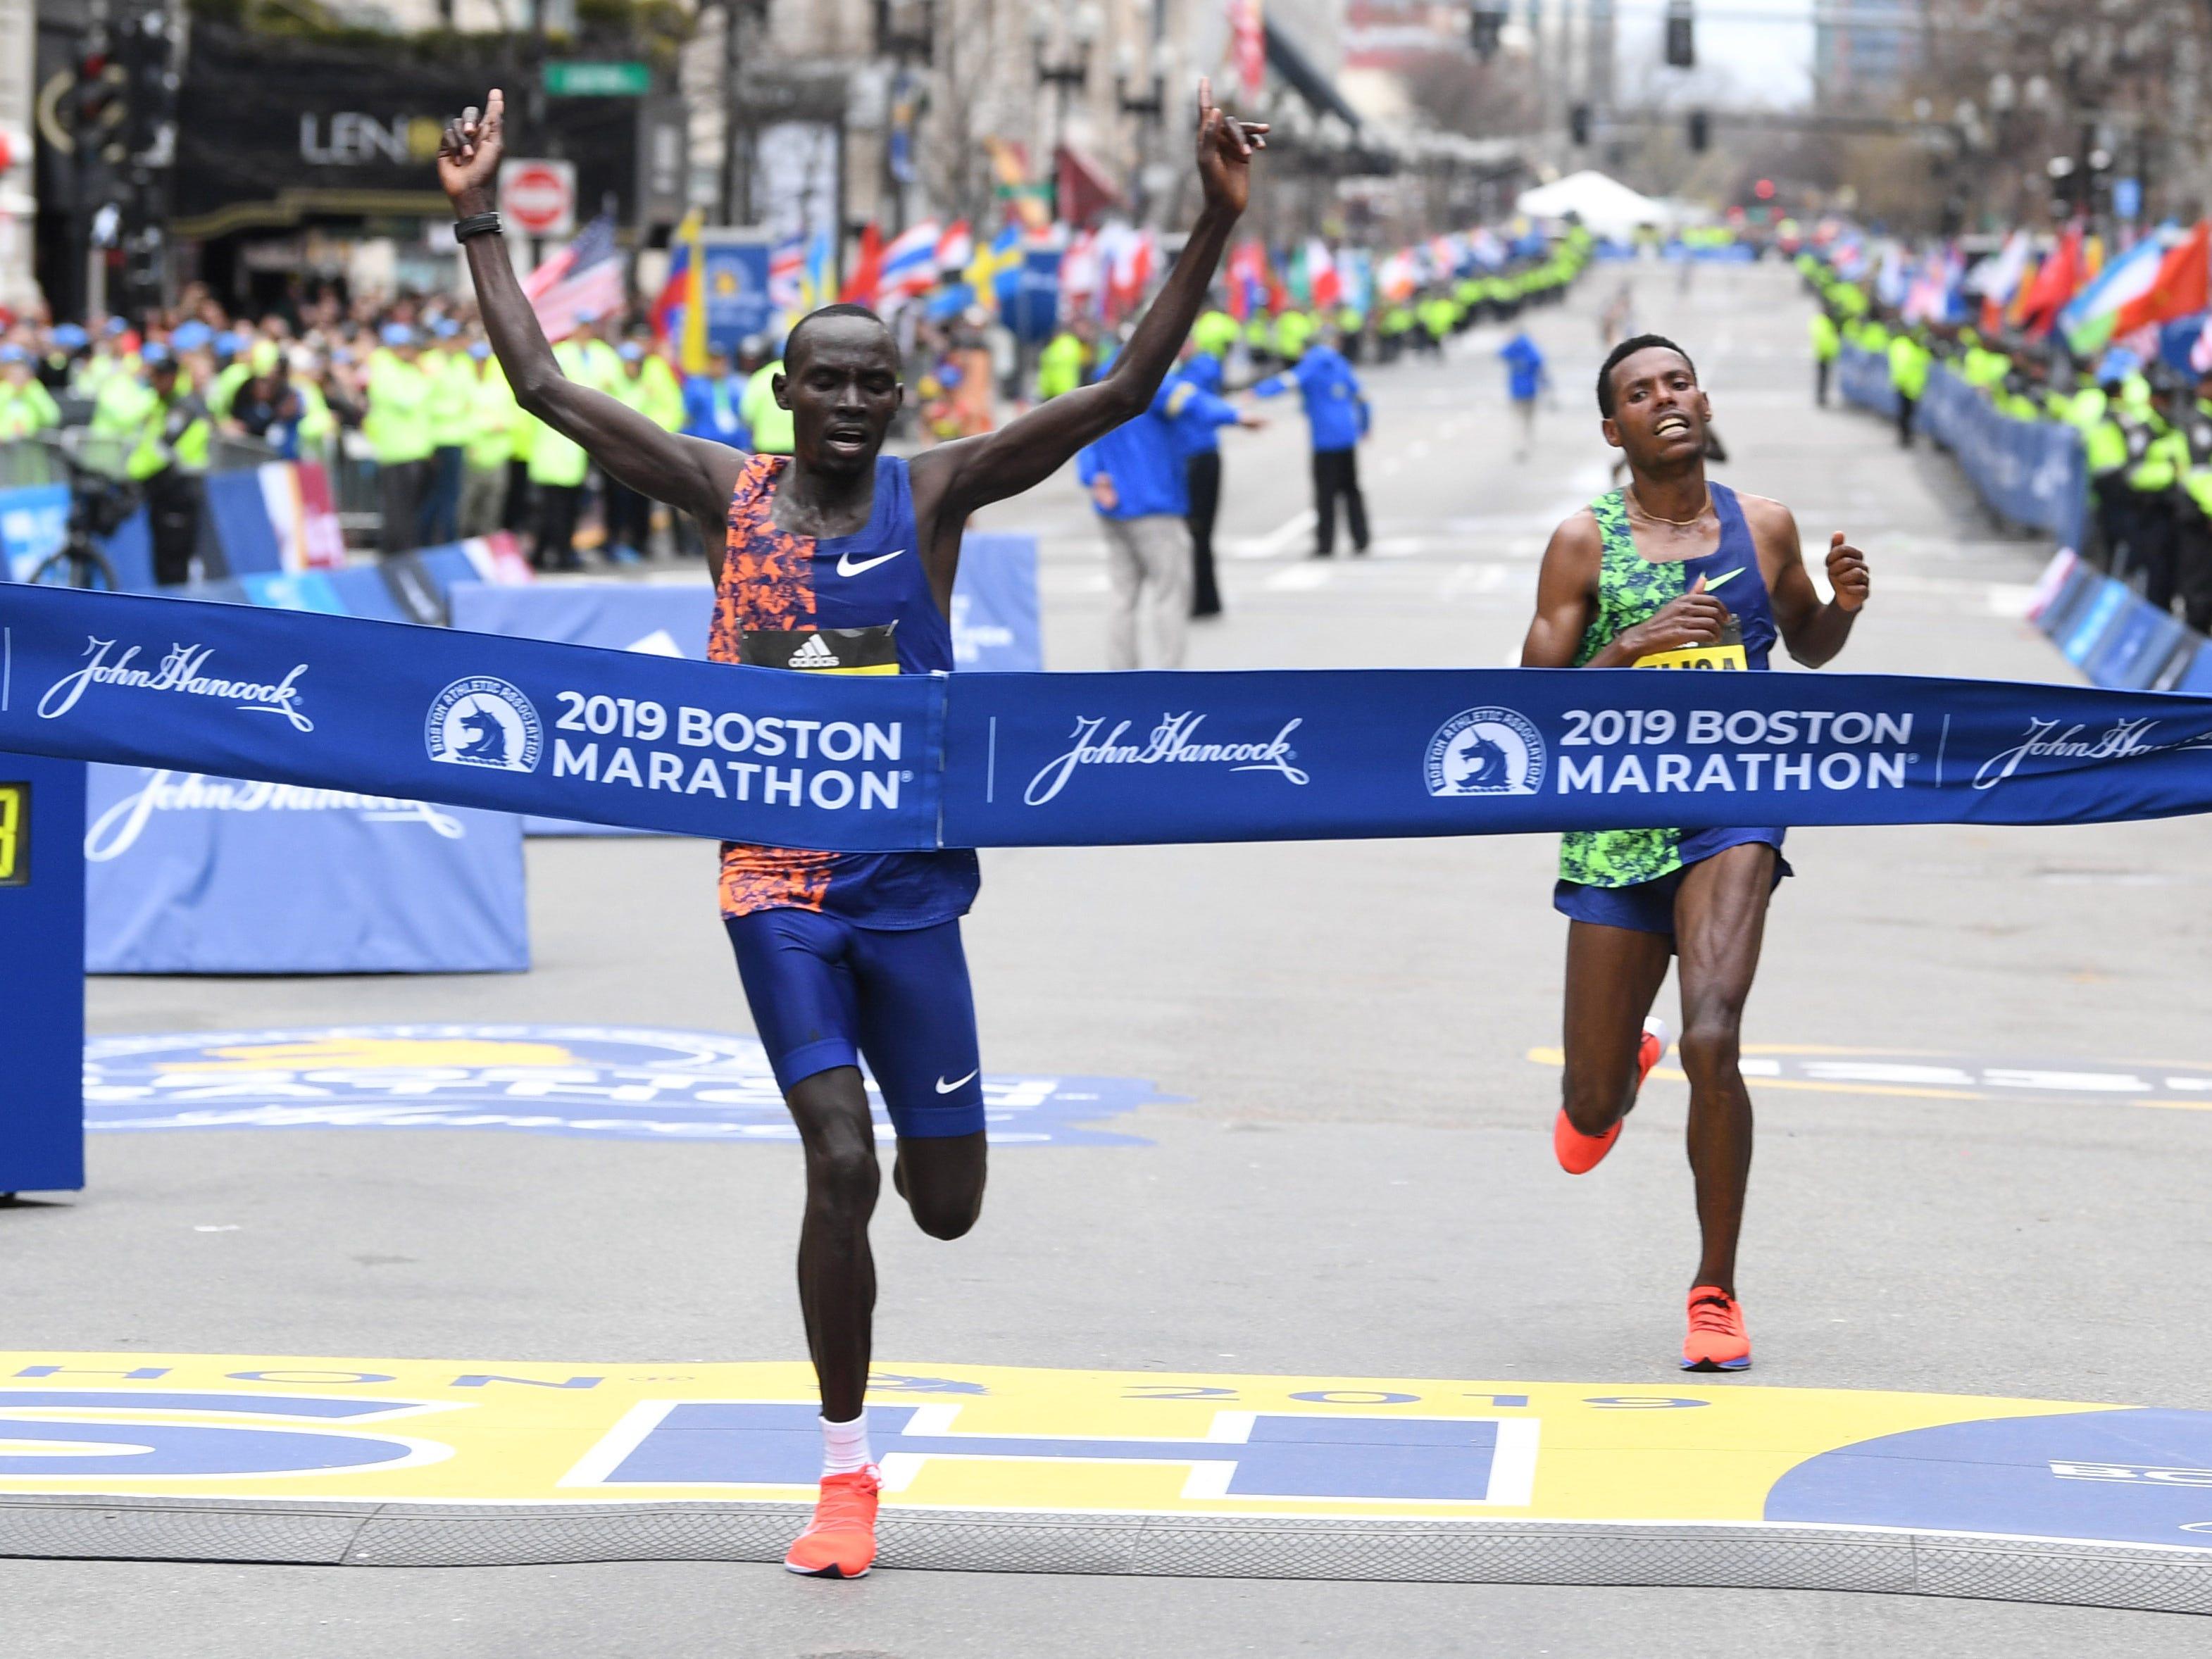 Lawrence Cherono (KEN) crosses the finish line to win the 2019 Boston Marathon. Lelisa Desisa (ETH) finishes second.